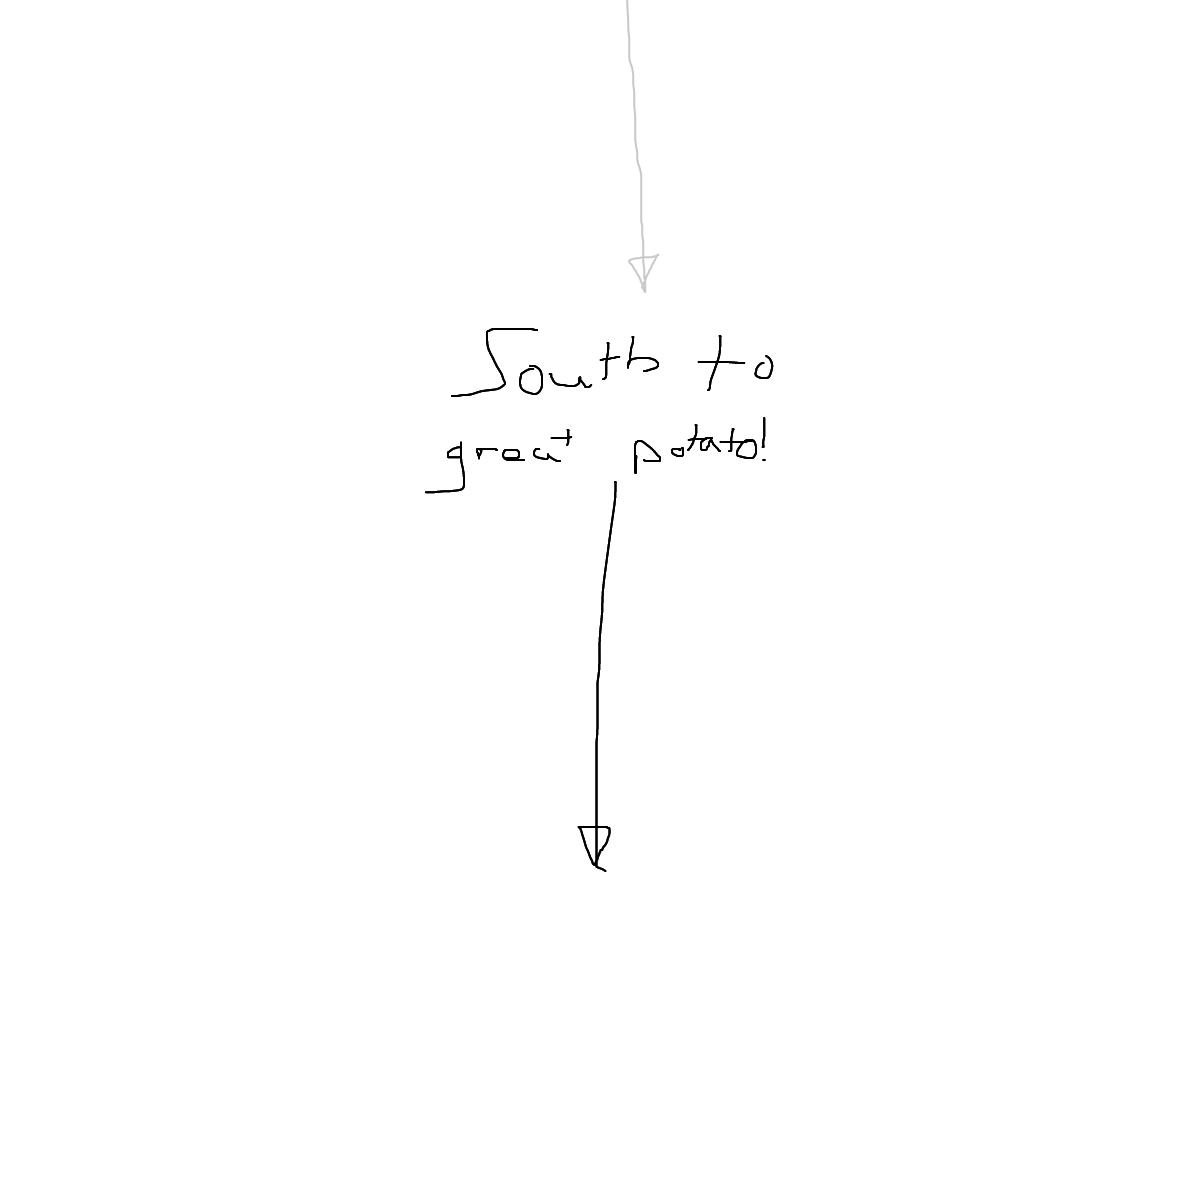 BAAAM drawing#17585 lat:56.5599555969238300lng: 25.4611454010009770